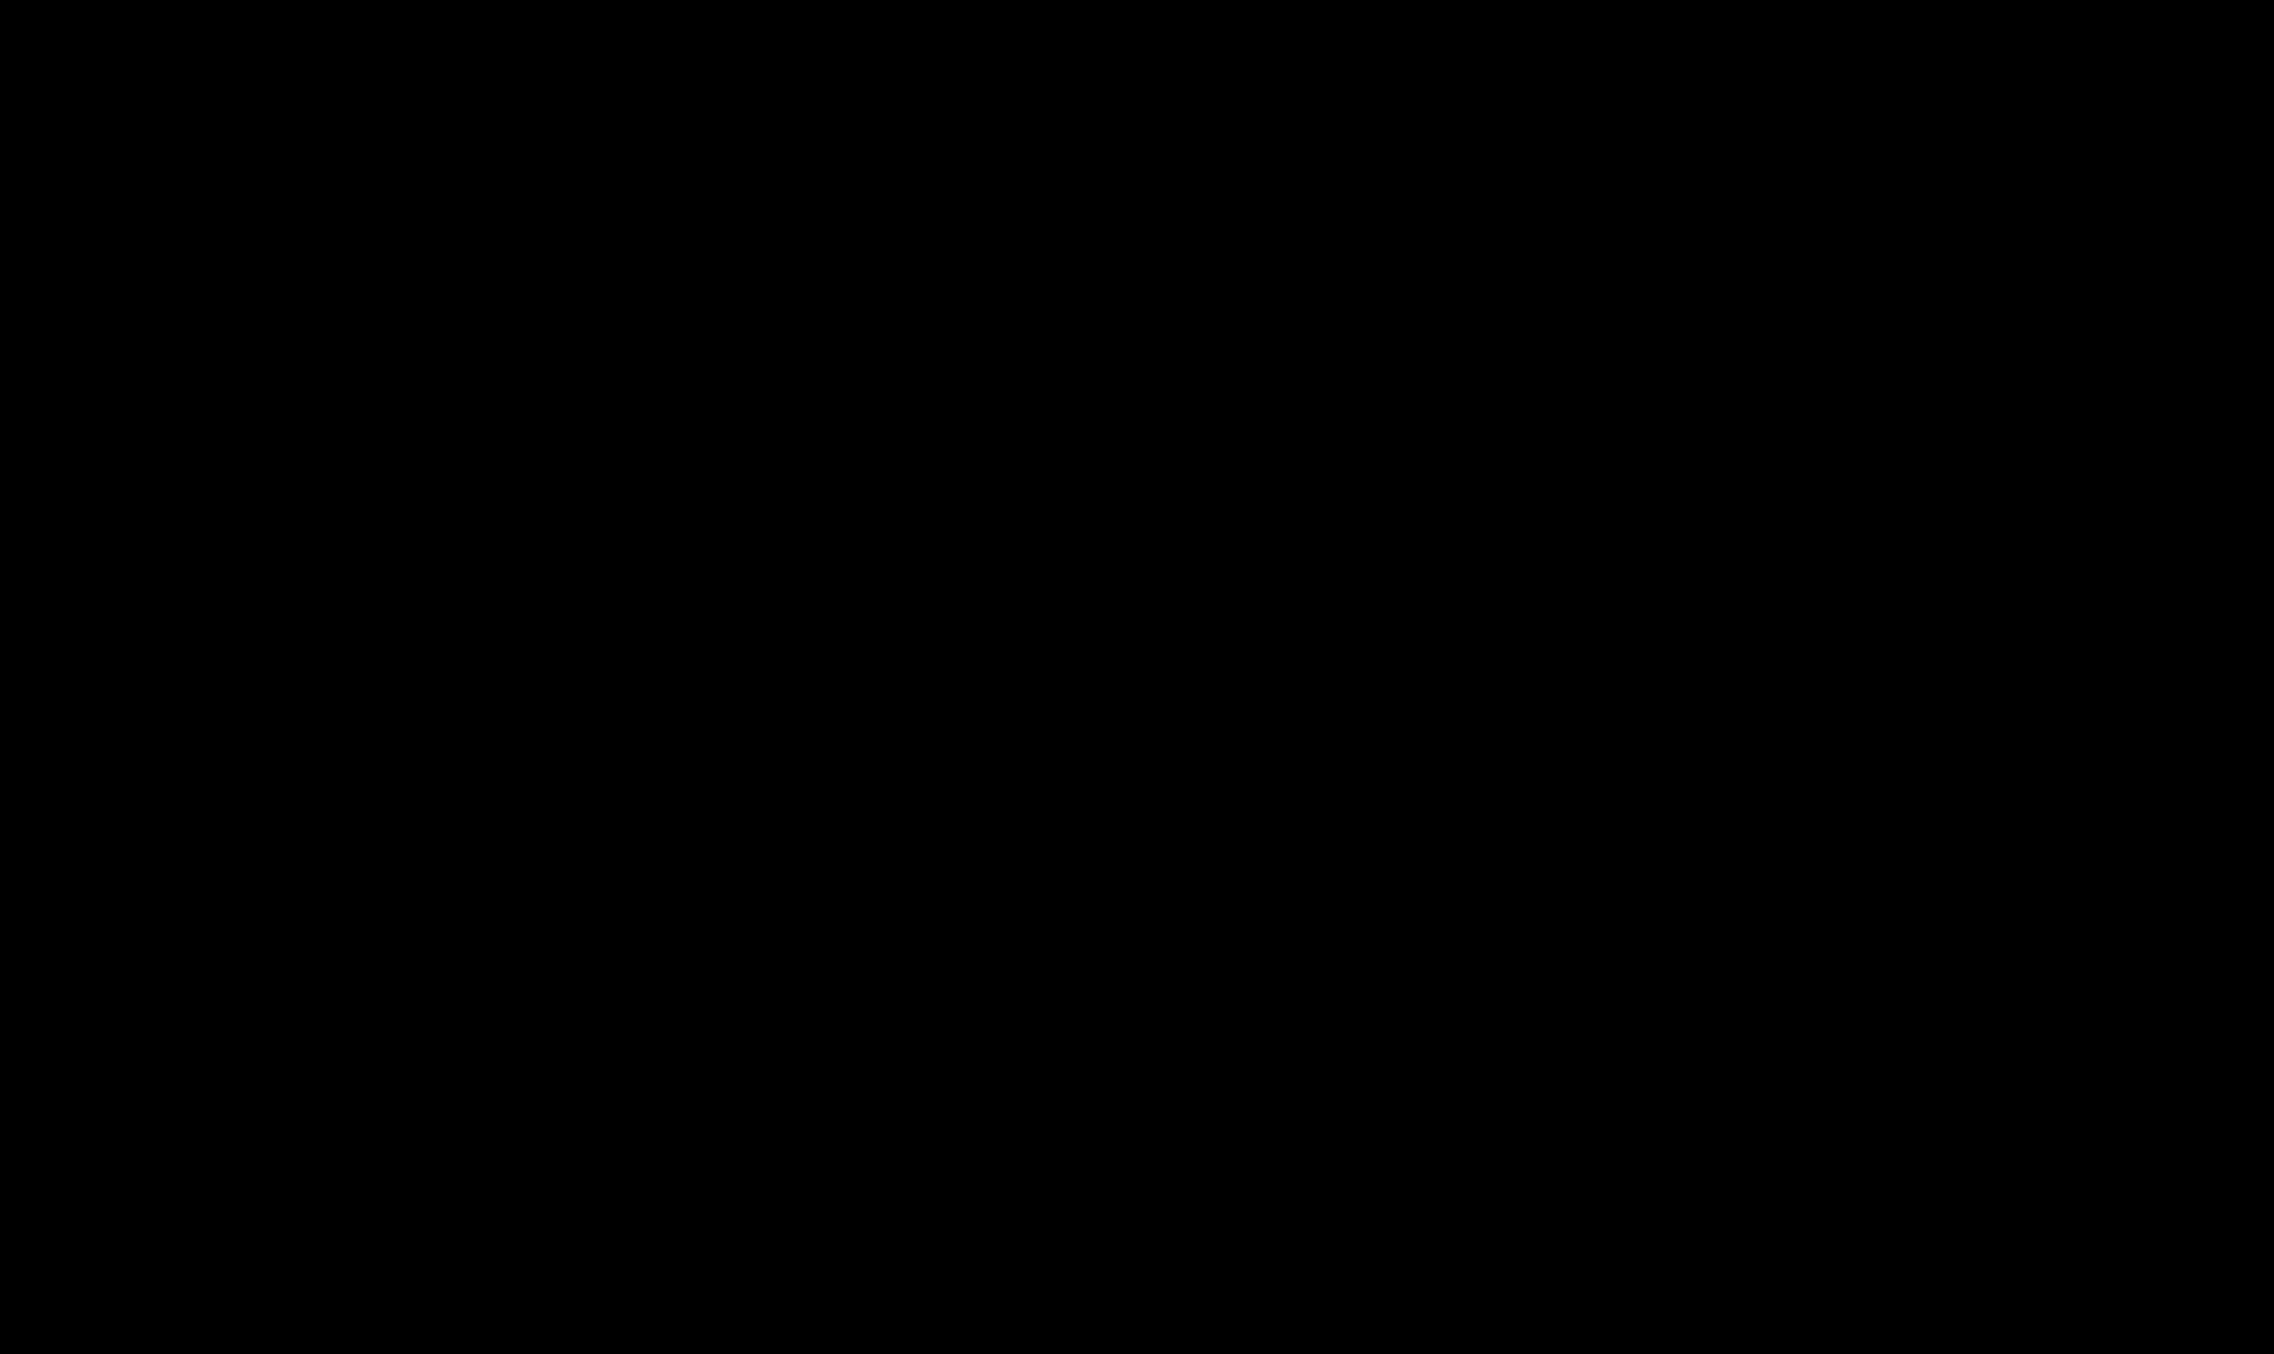 2274x1354 Clipart